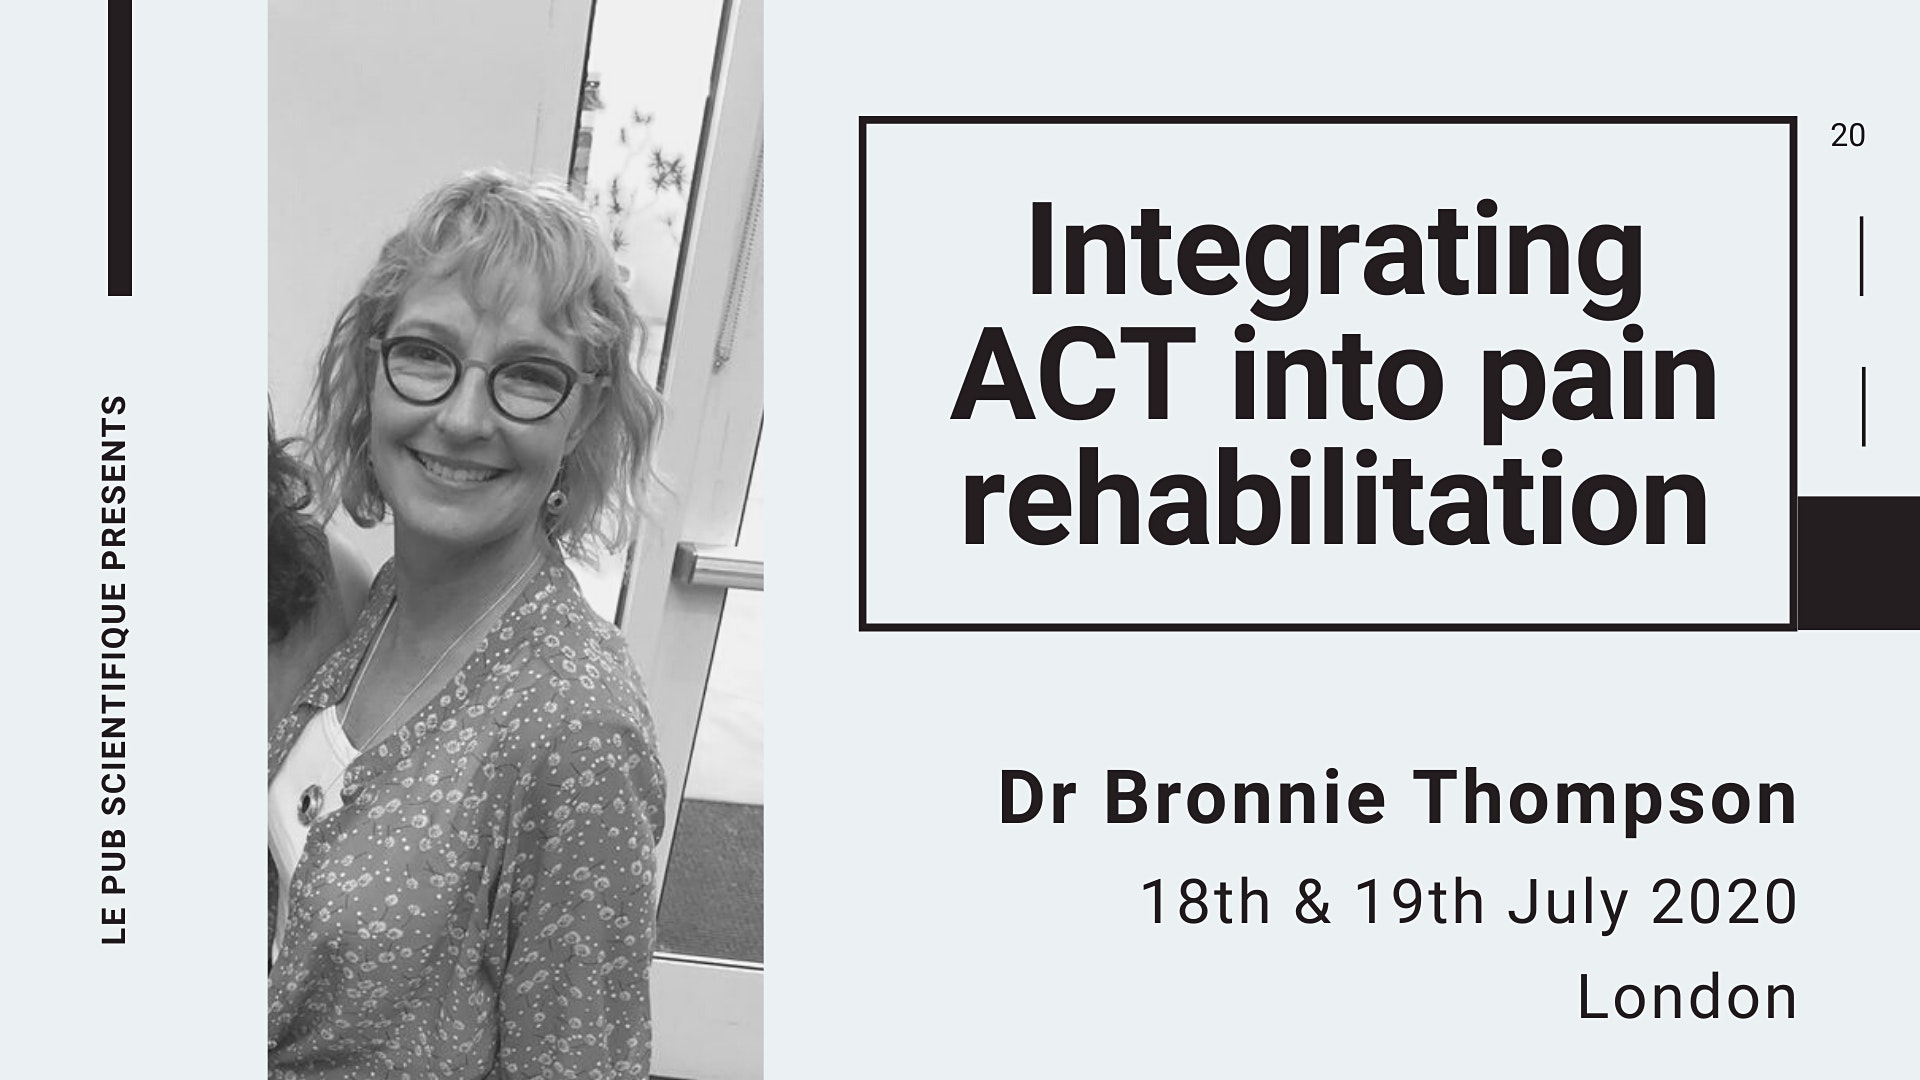 Integrating ACT into pain rehabilitation